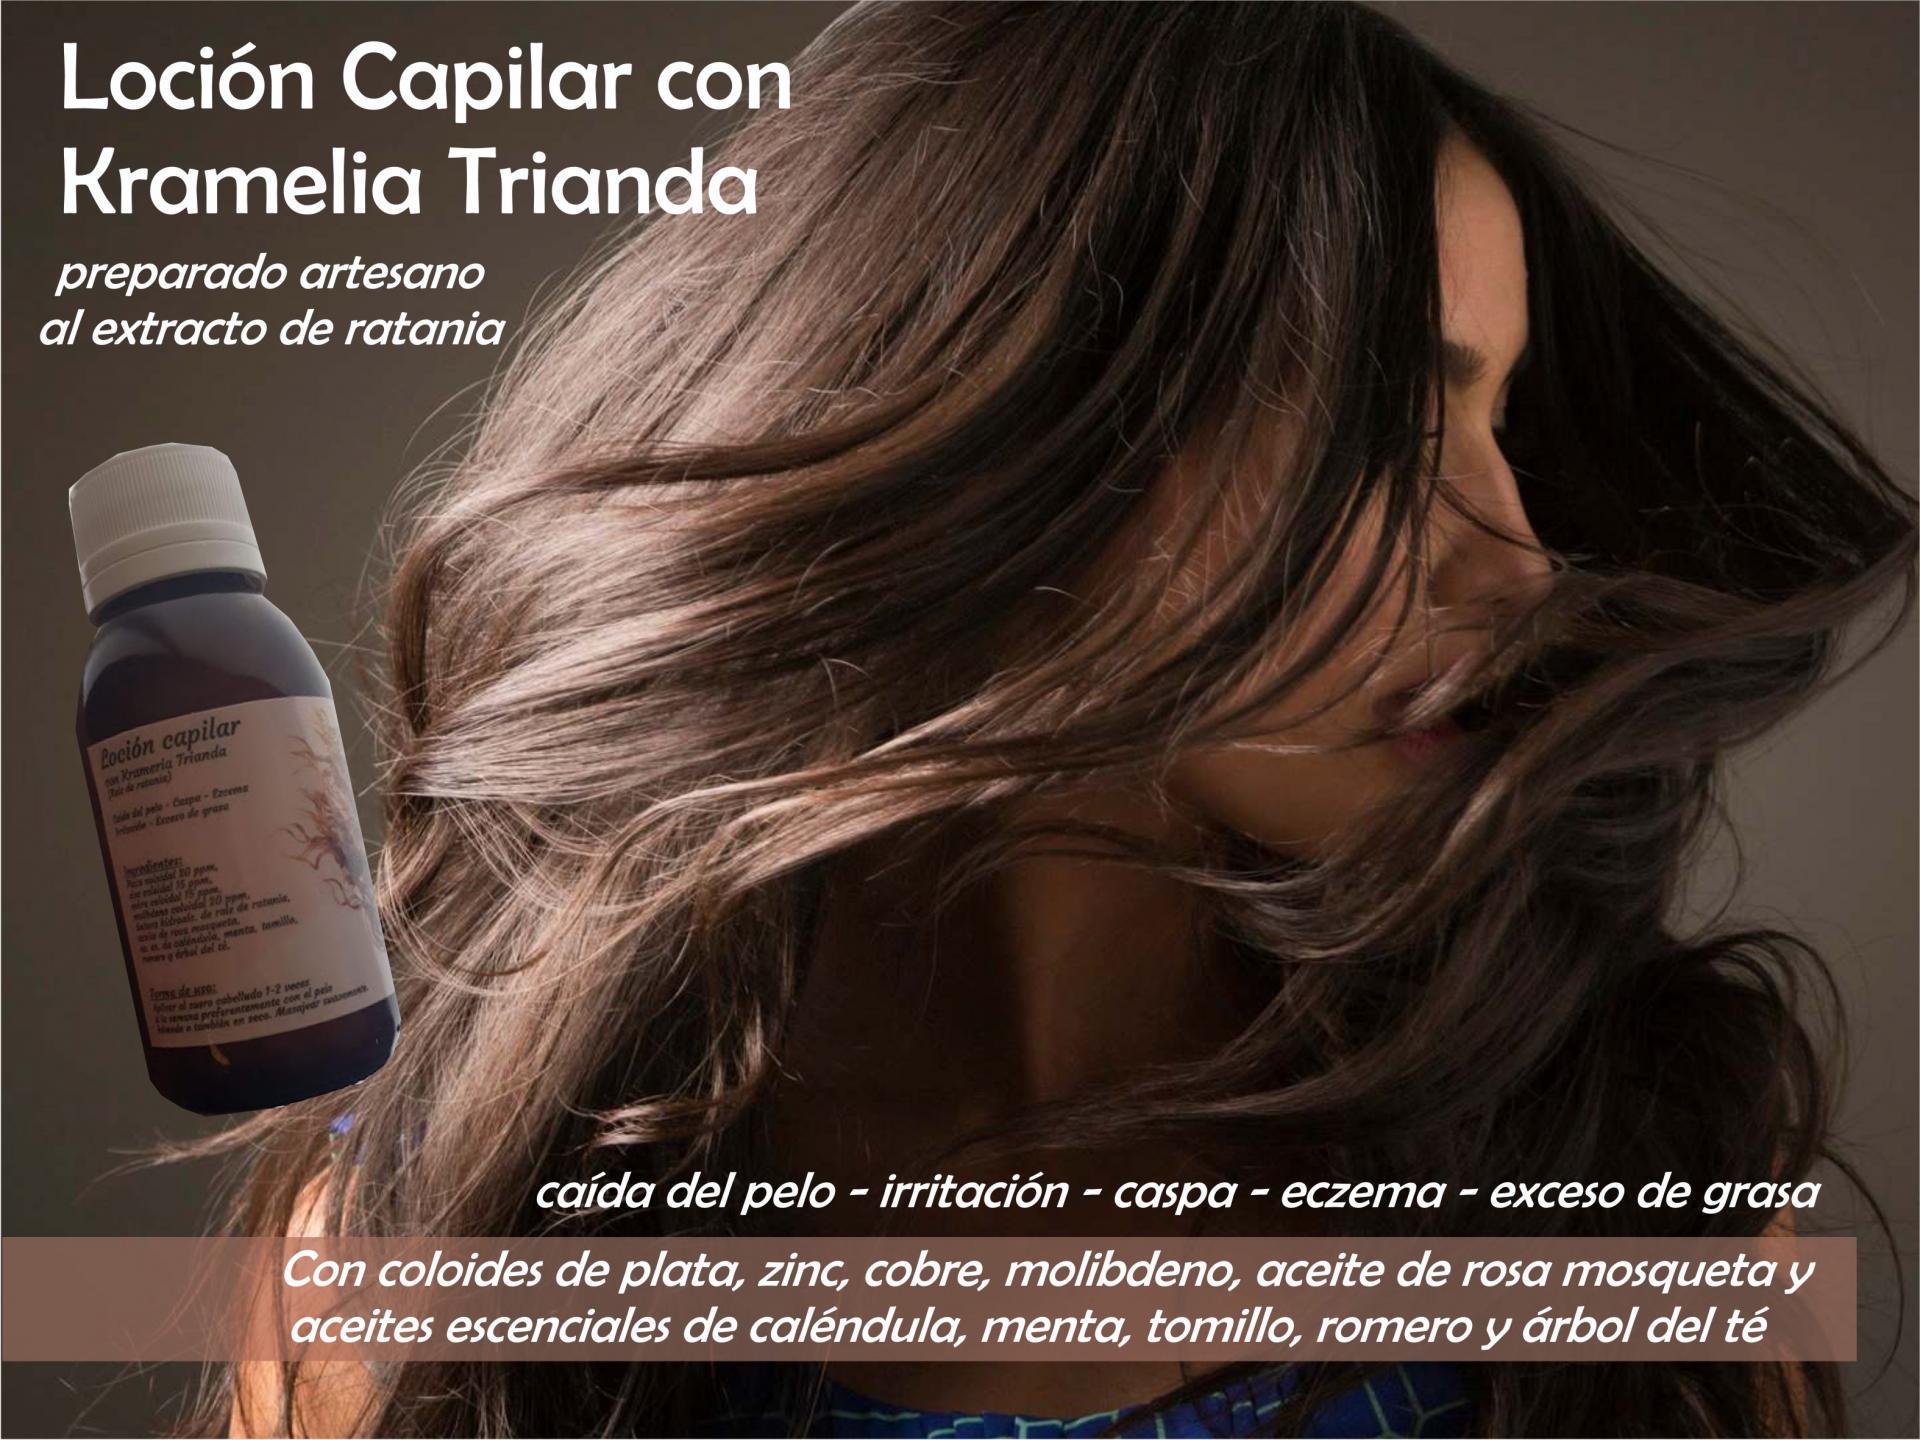 LOCIÓN CAPILAR (caída del pelo, irritación, ezcema, exceso de grasa...). 100ml